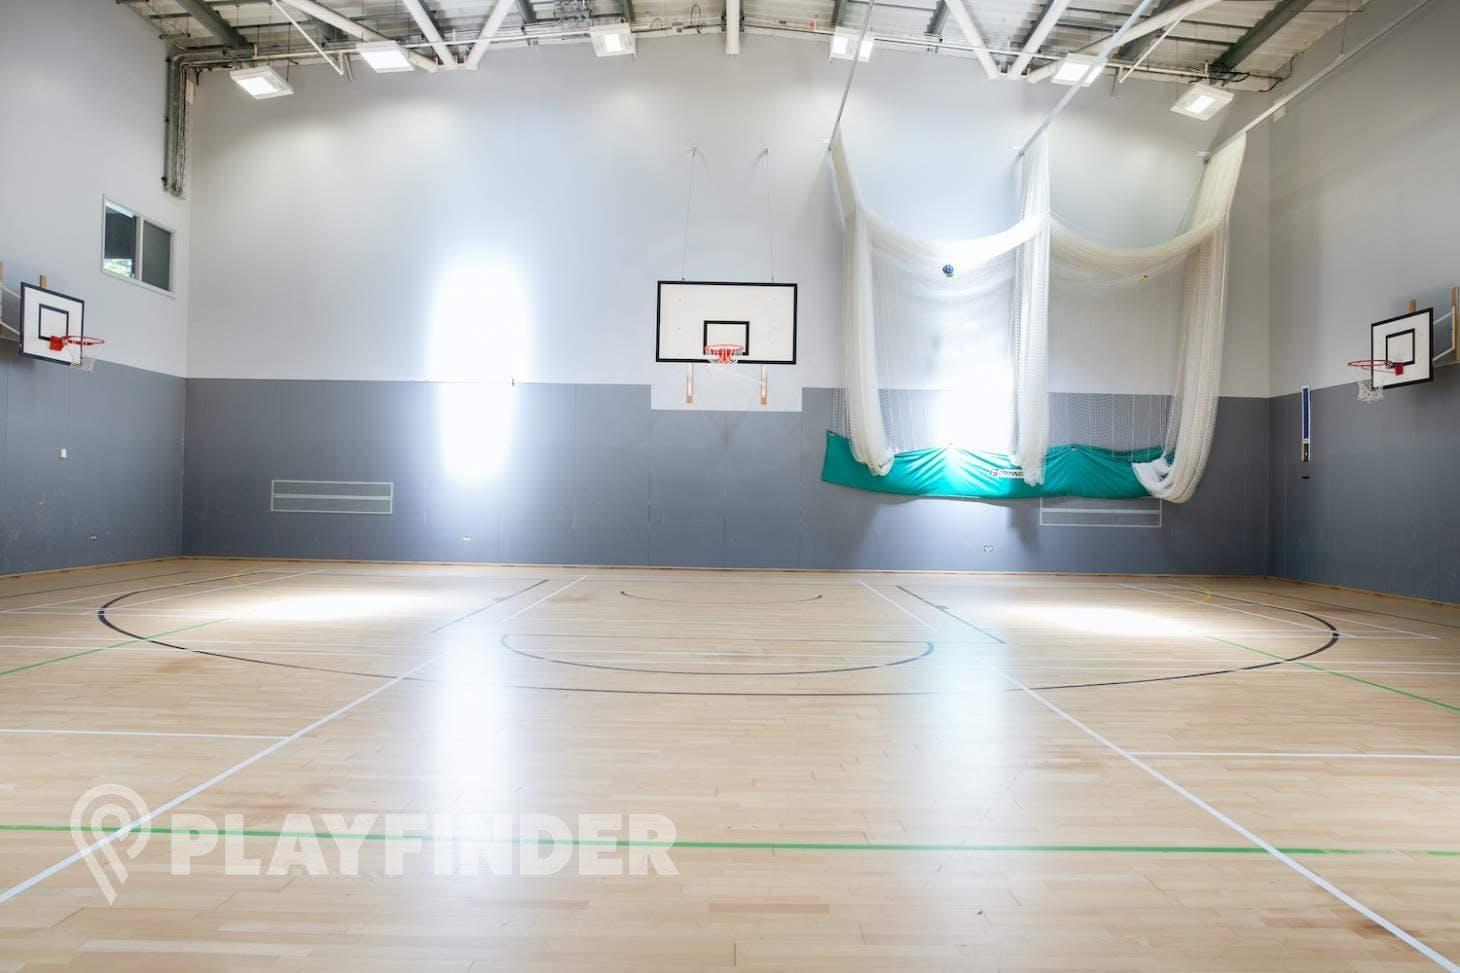 St Aloysius' College Nets   Sports hall cricket facilities